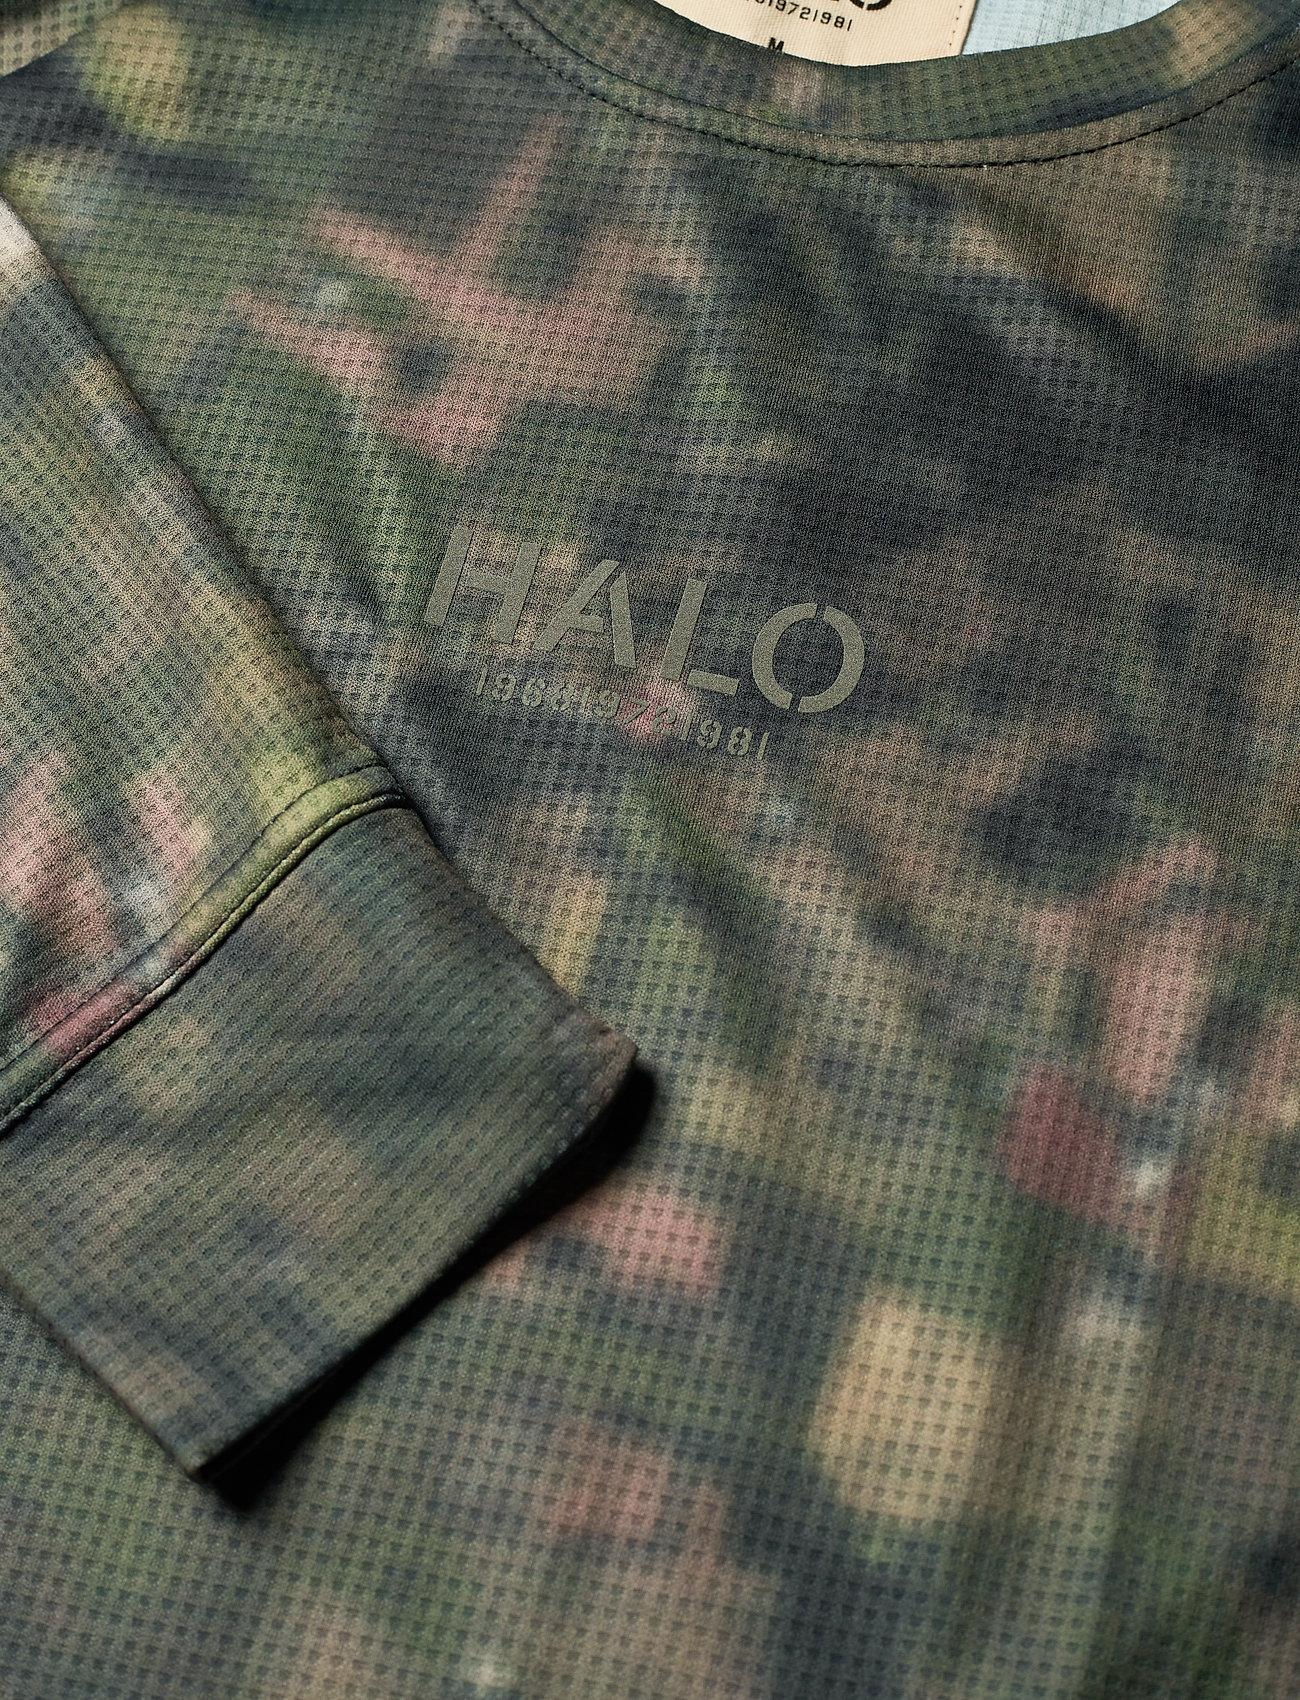 HALO HALO Camo Longsleeve - T-skjorter AOP GREEN CAMO - Menn Klær